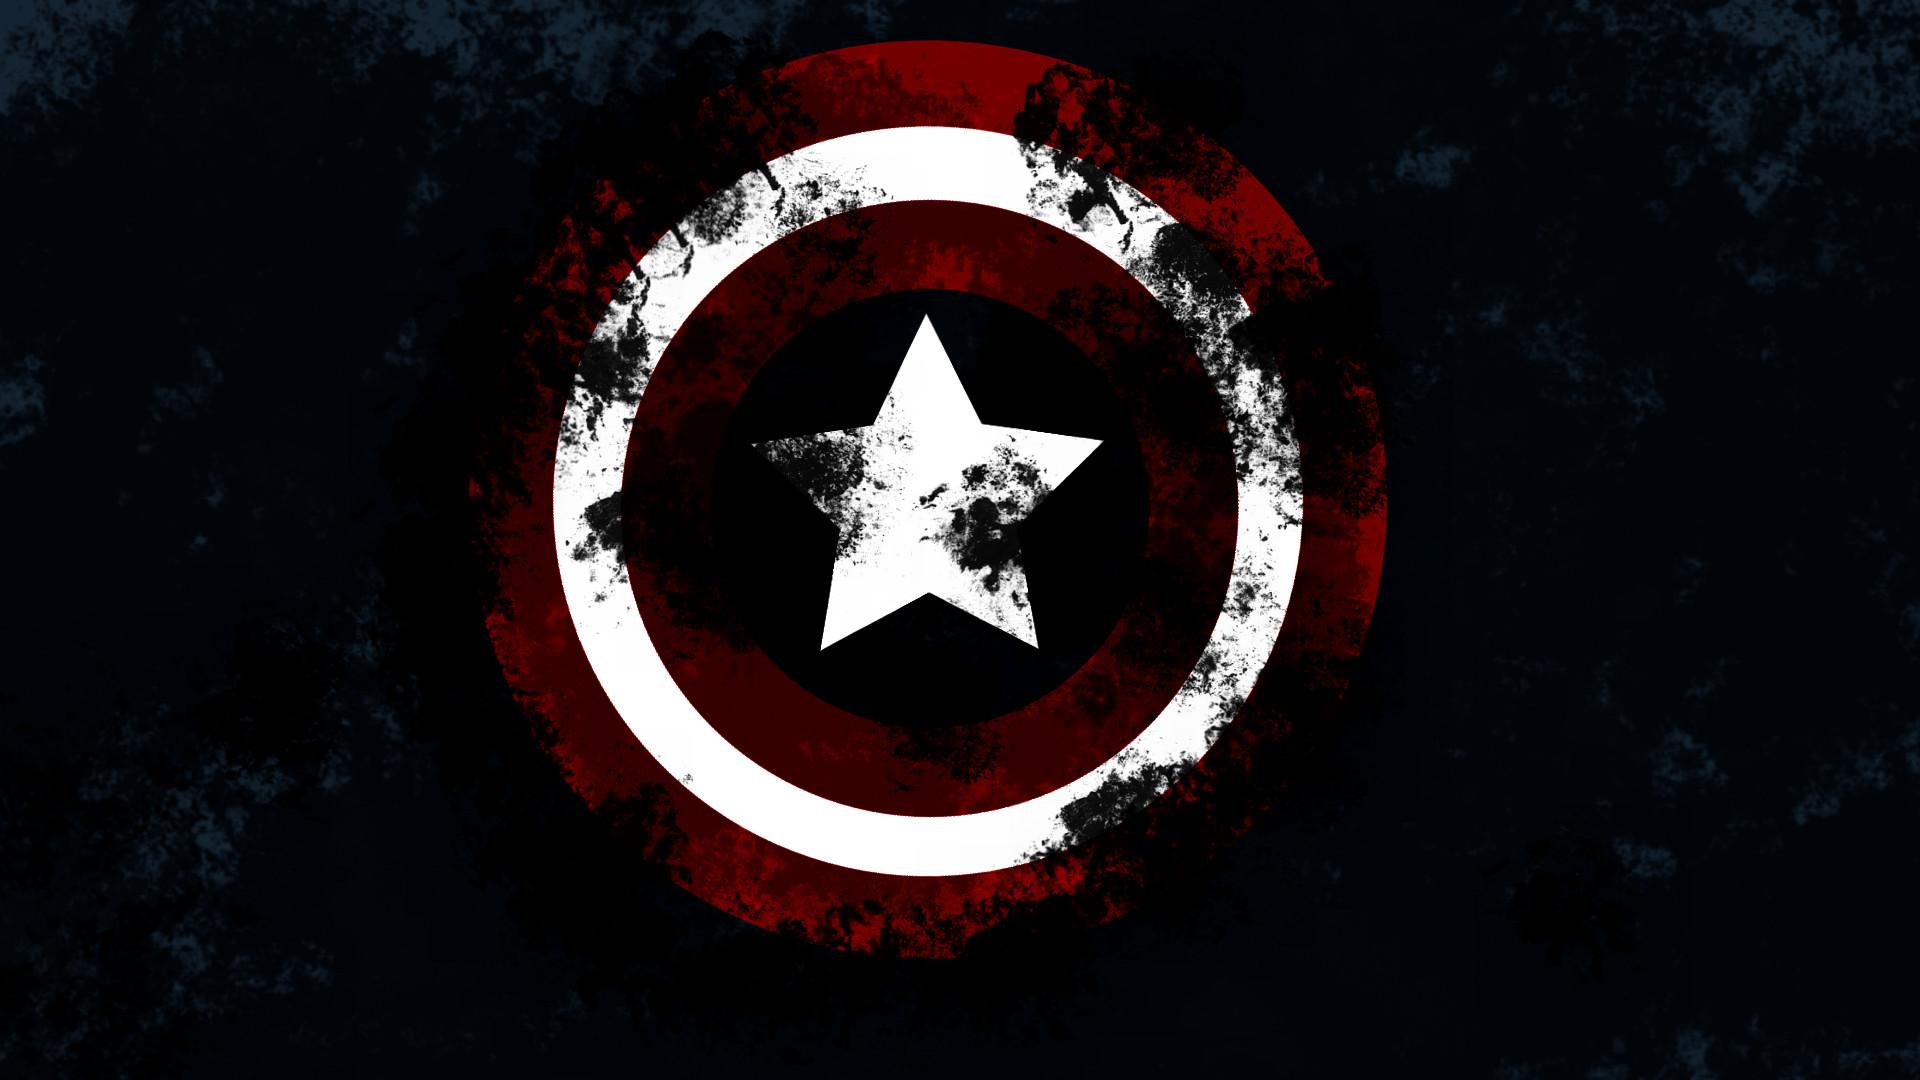 Captain America Shield Wallpaper HD | HD Wallpapers, Backgrounds .